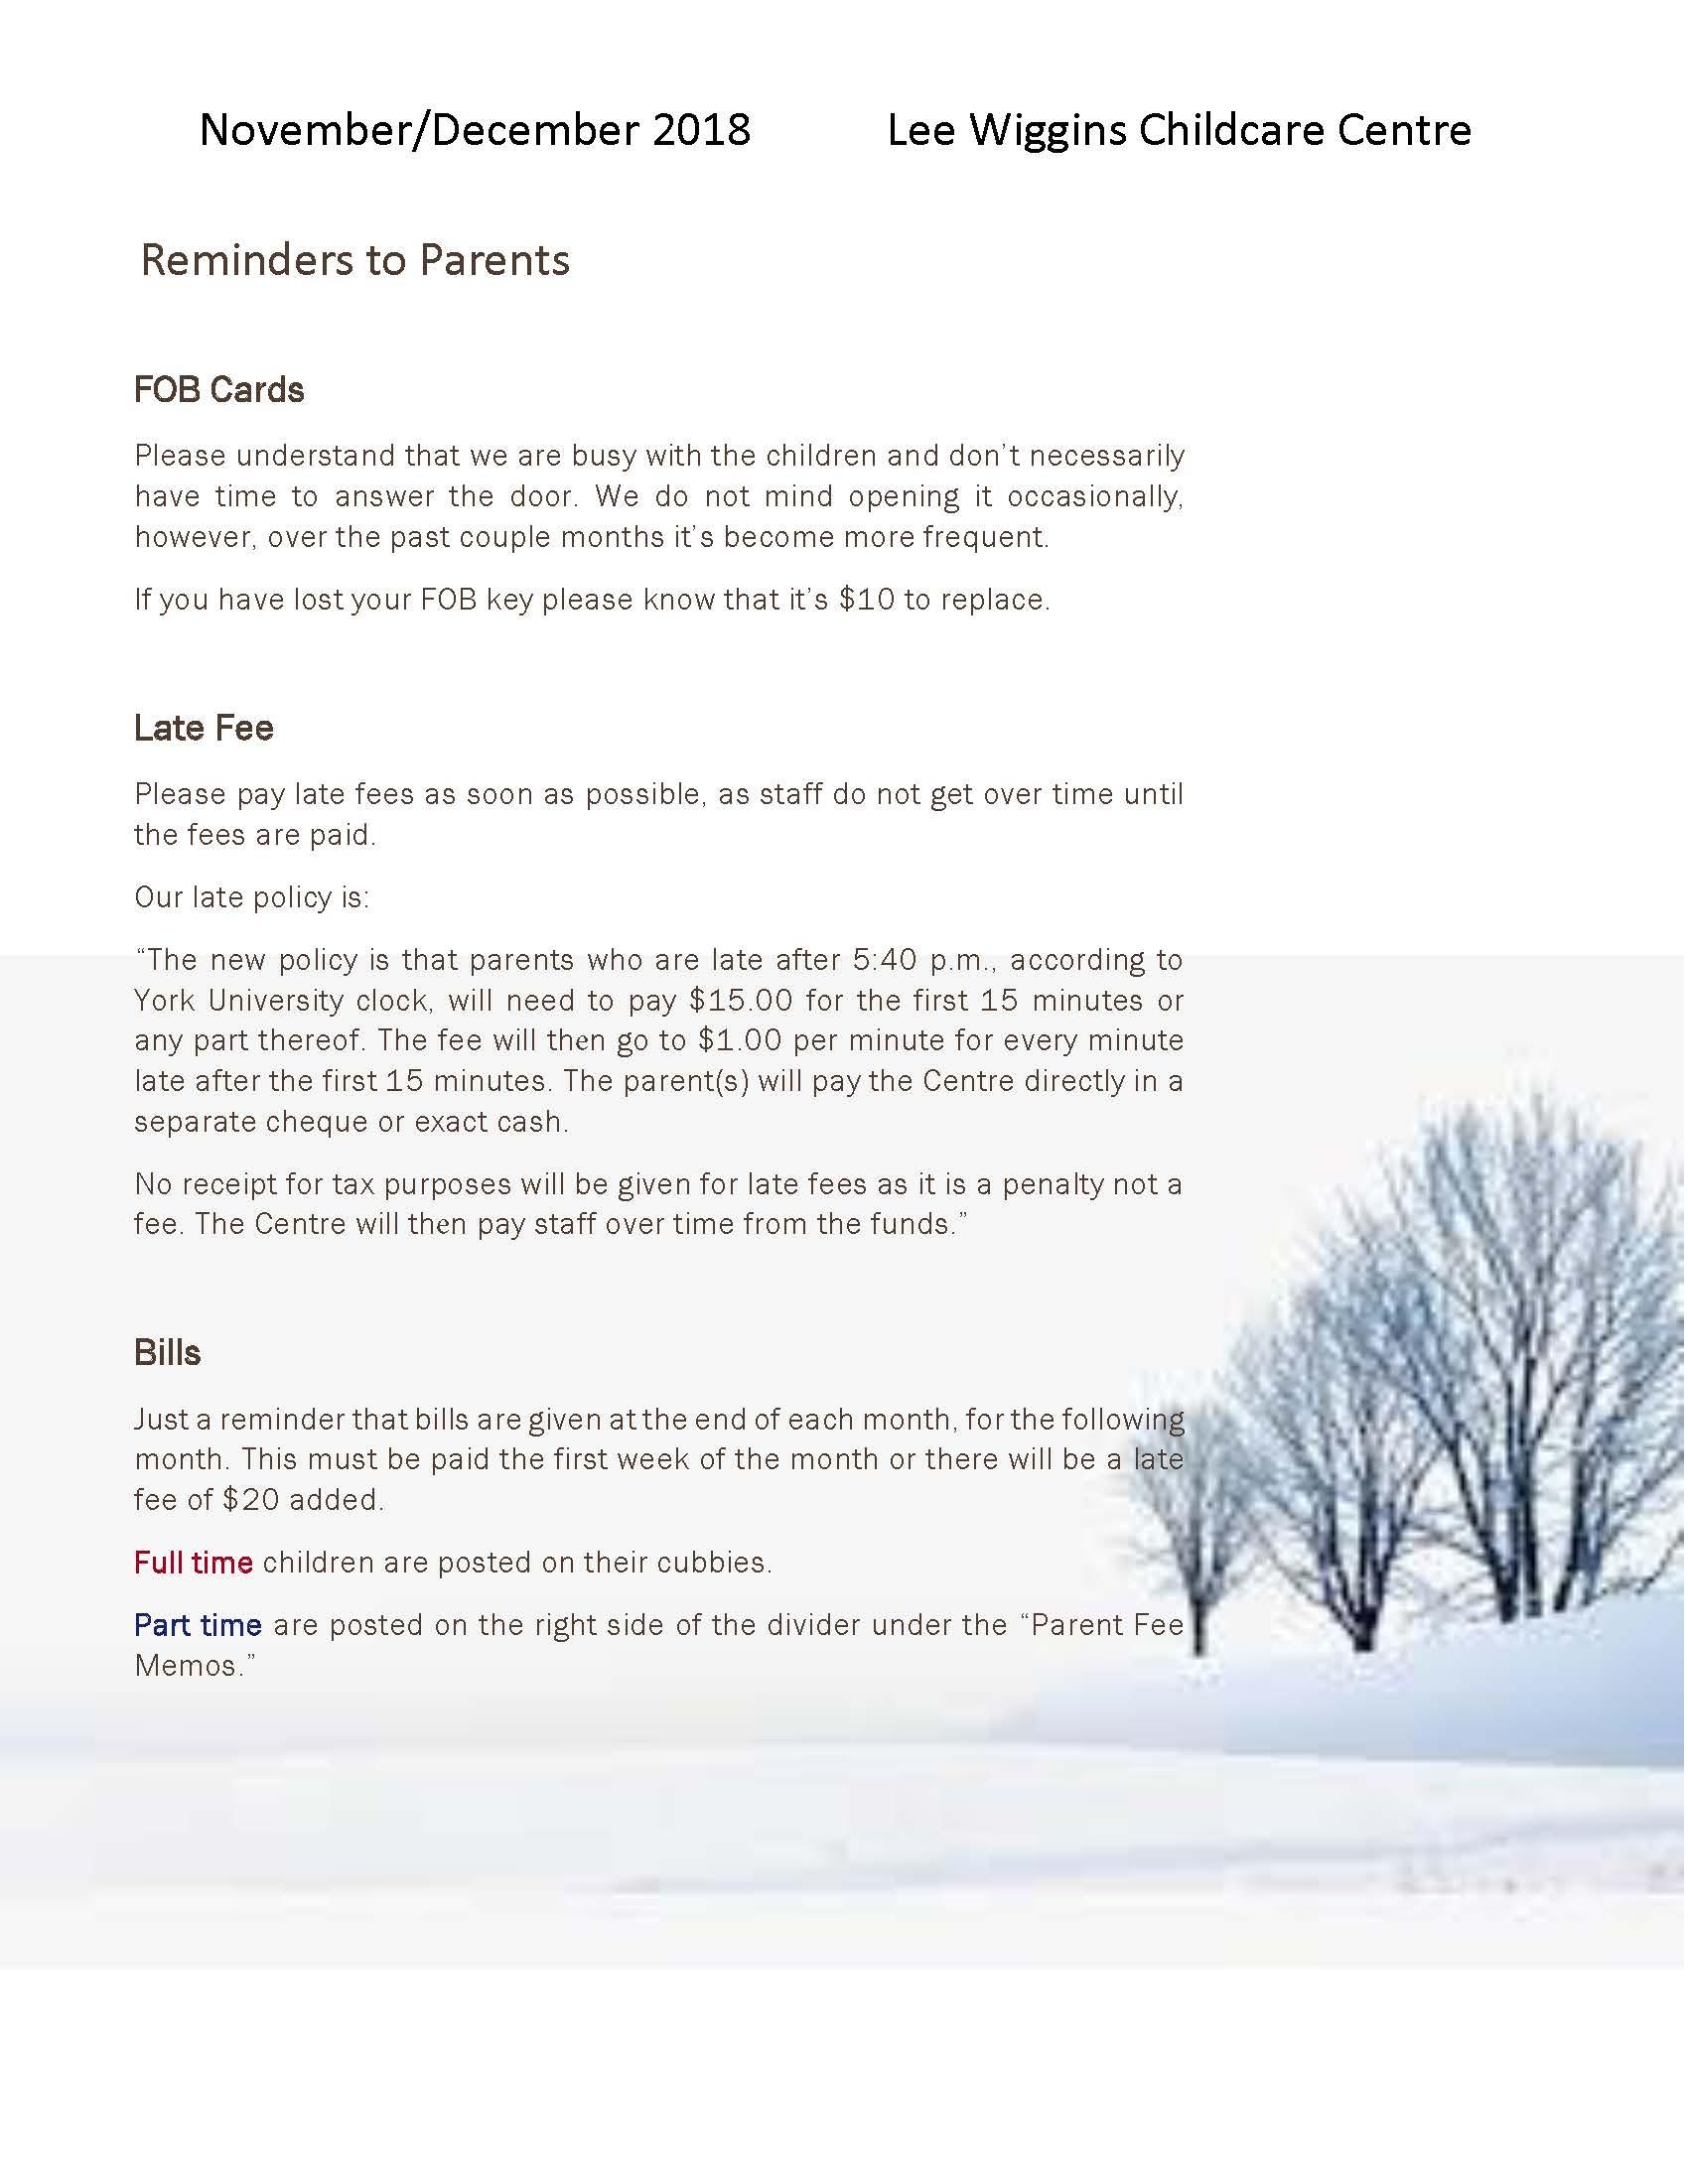 November-December-2018-Newsletter_Page_3.jpg